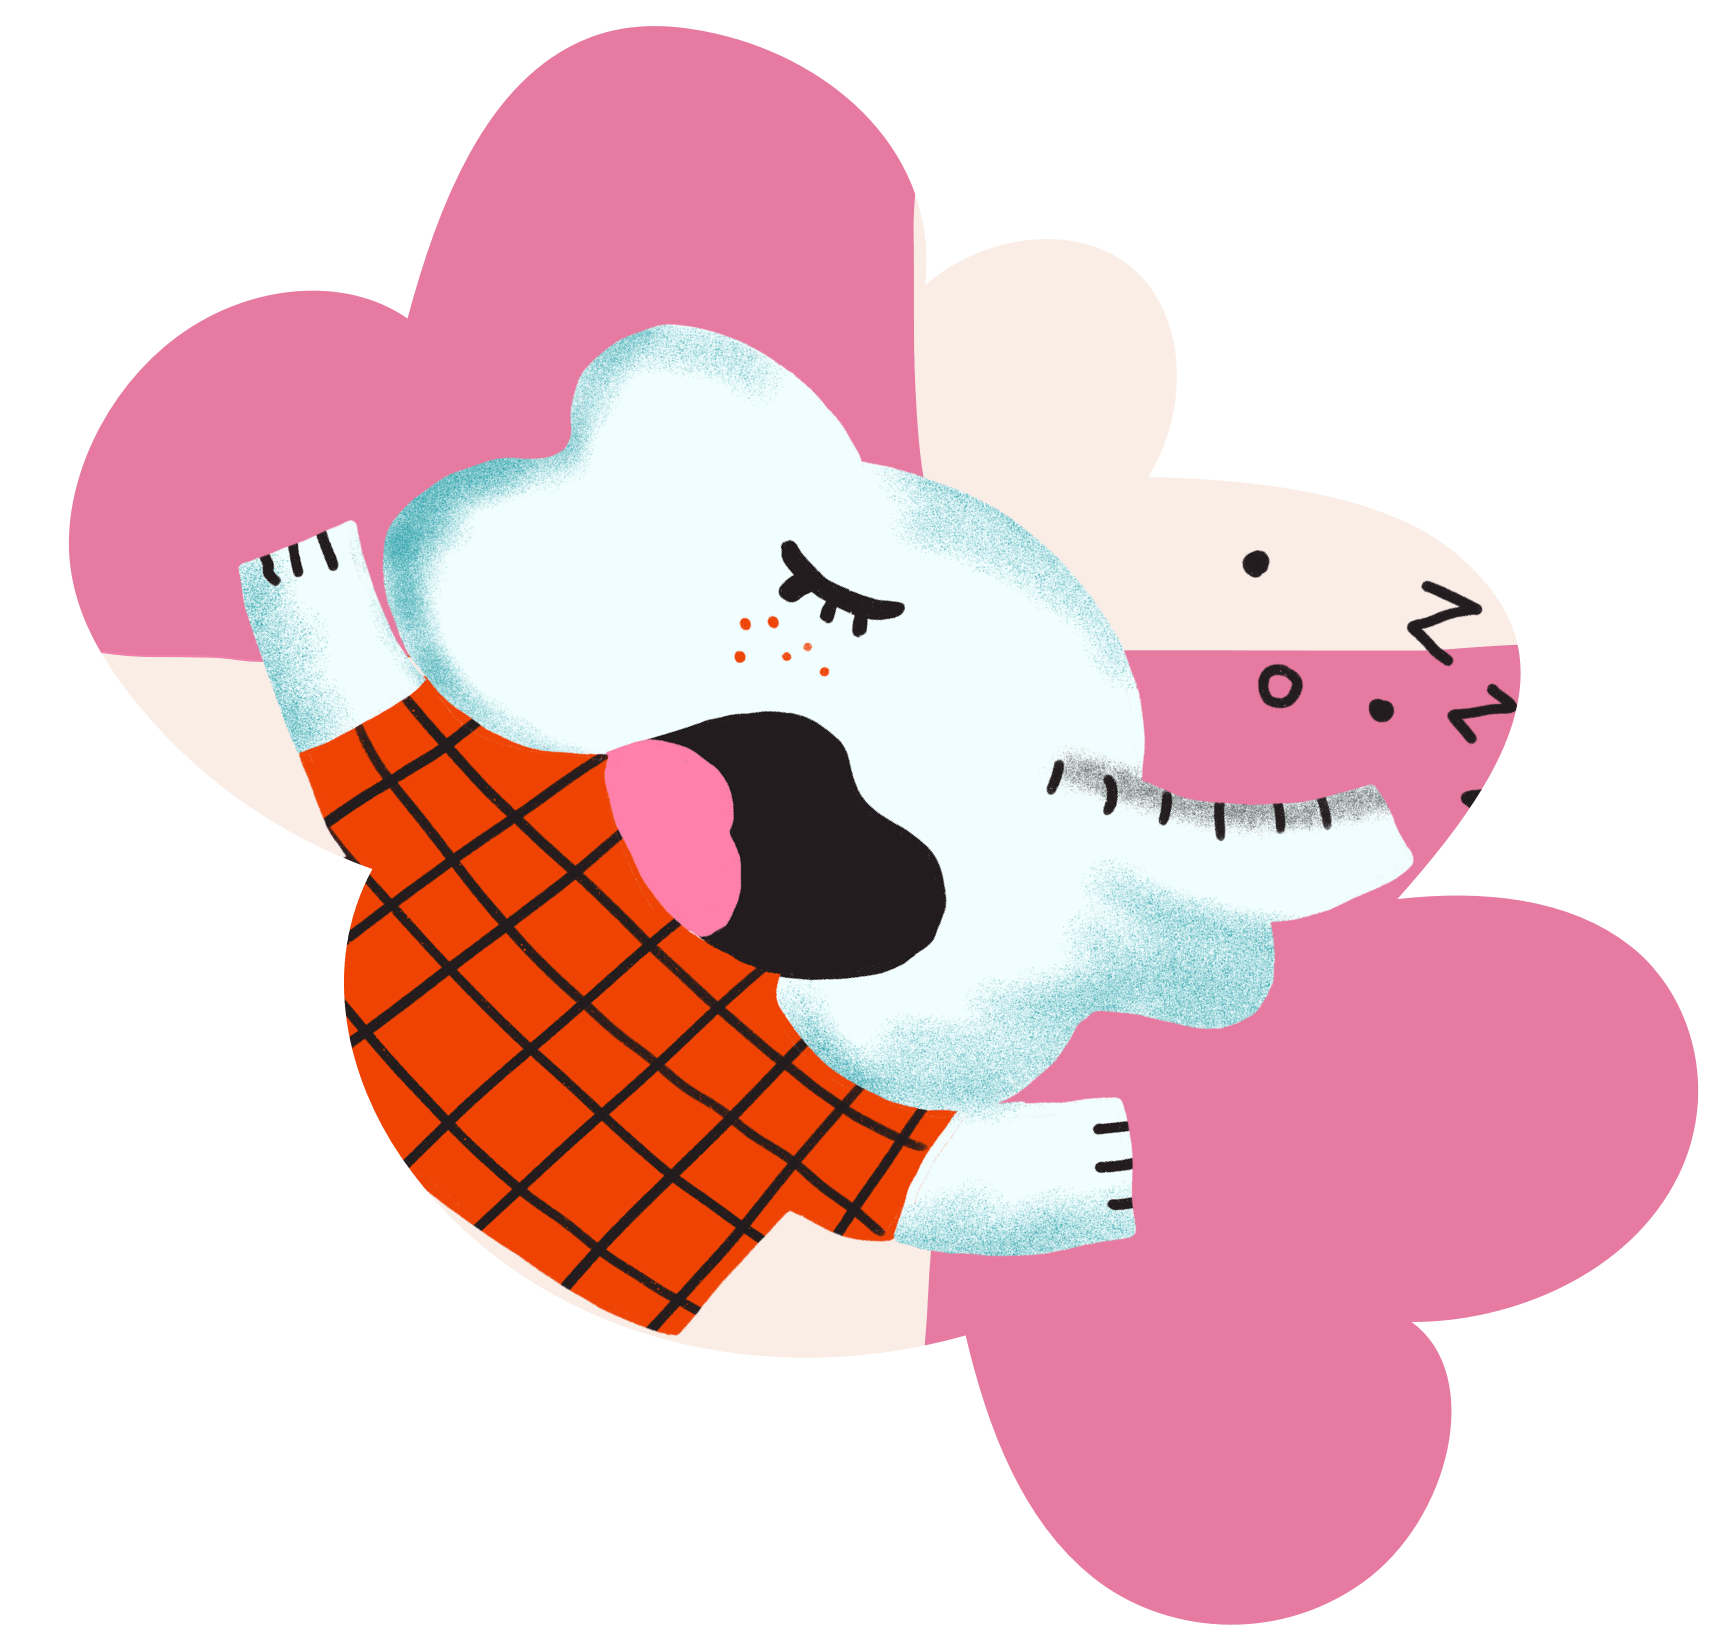 Illustration Animal Image